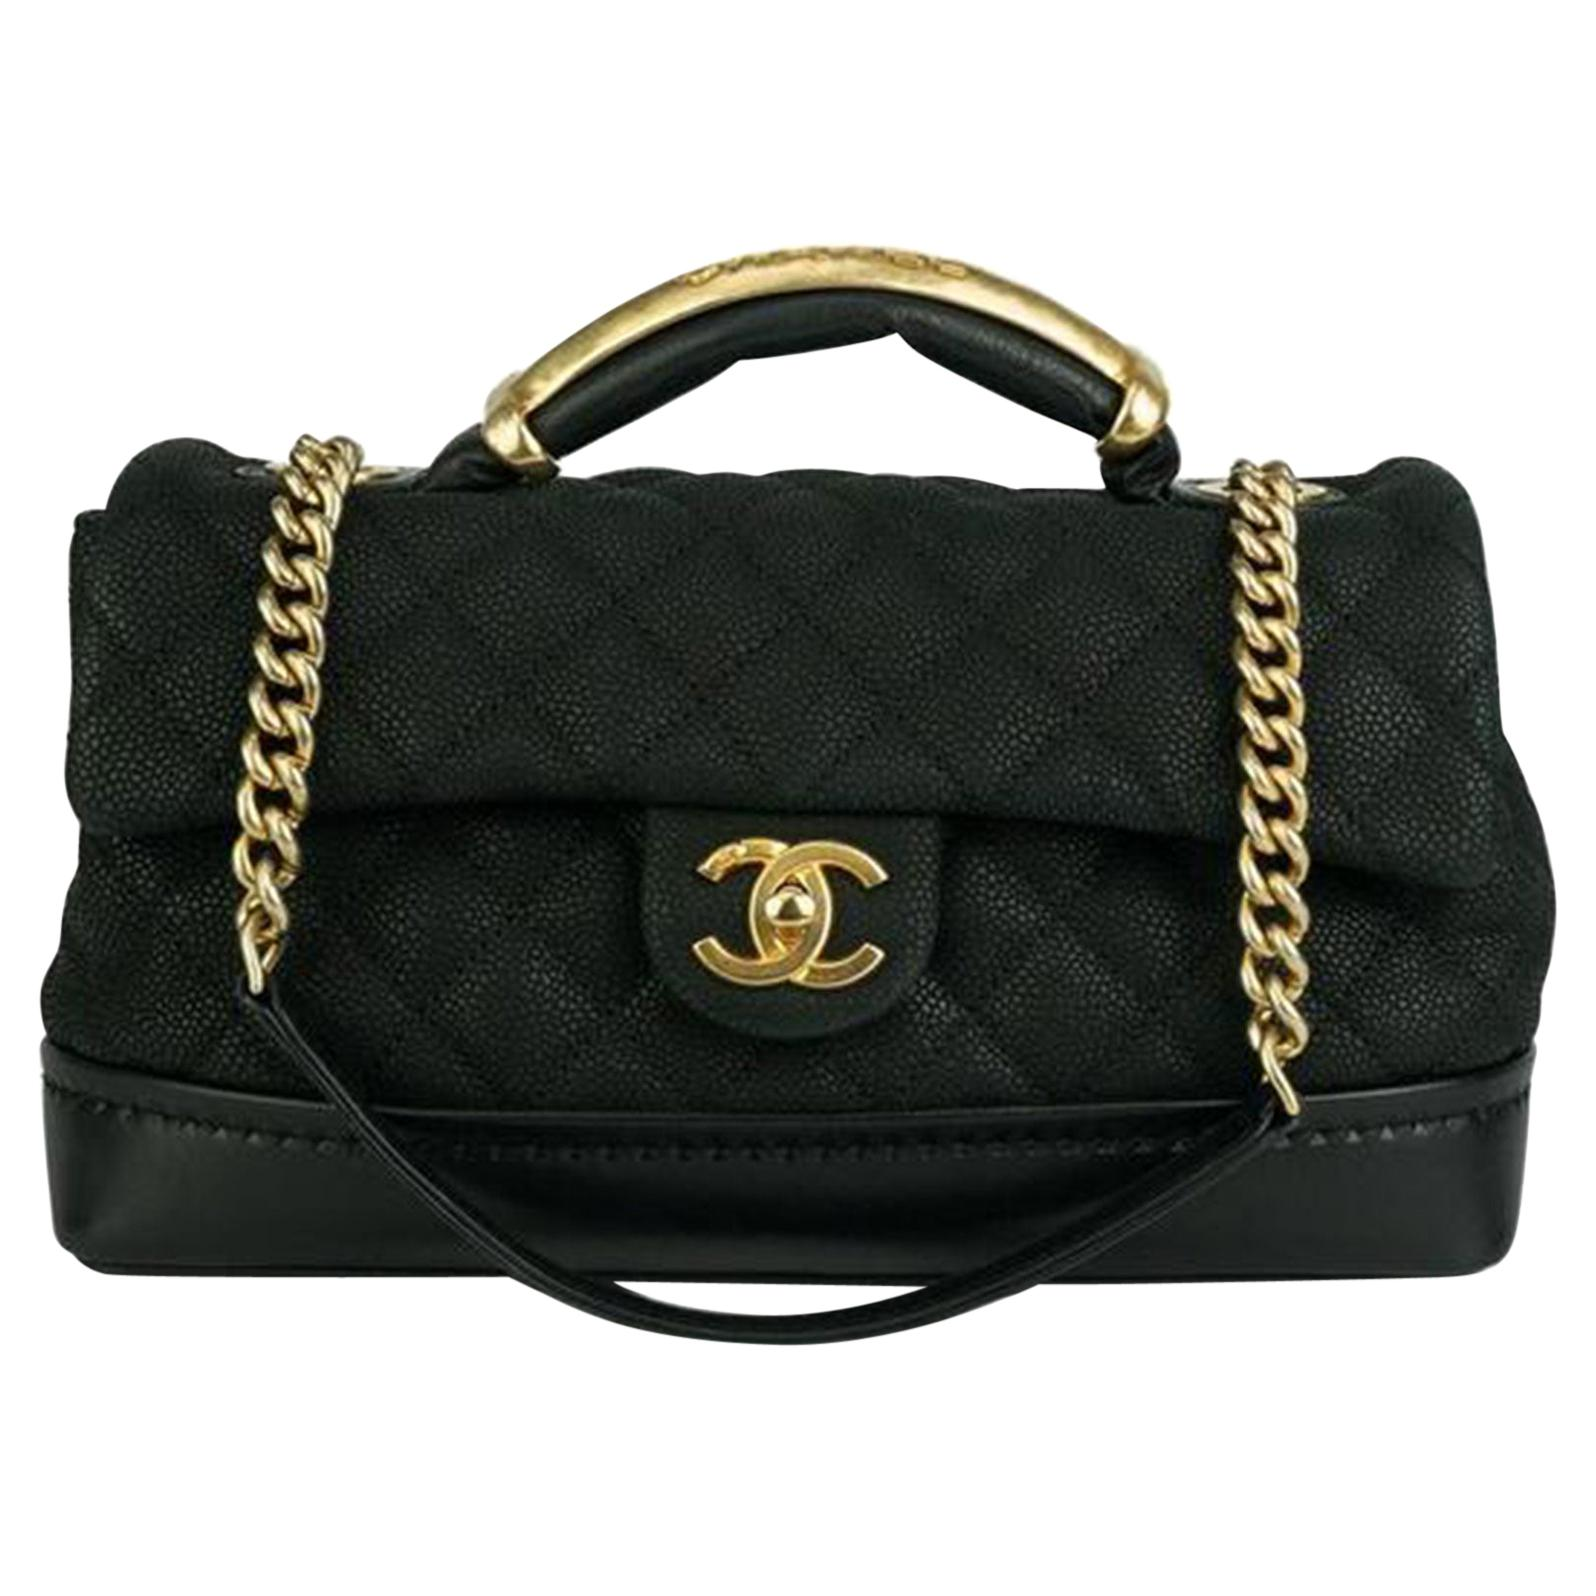 Chanel Iridescent Caviar Grain Vanity Tote Crossbody Flap Bag